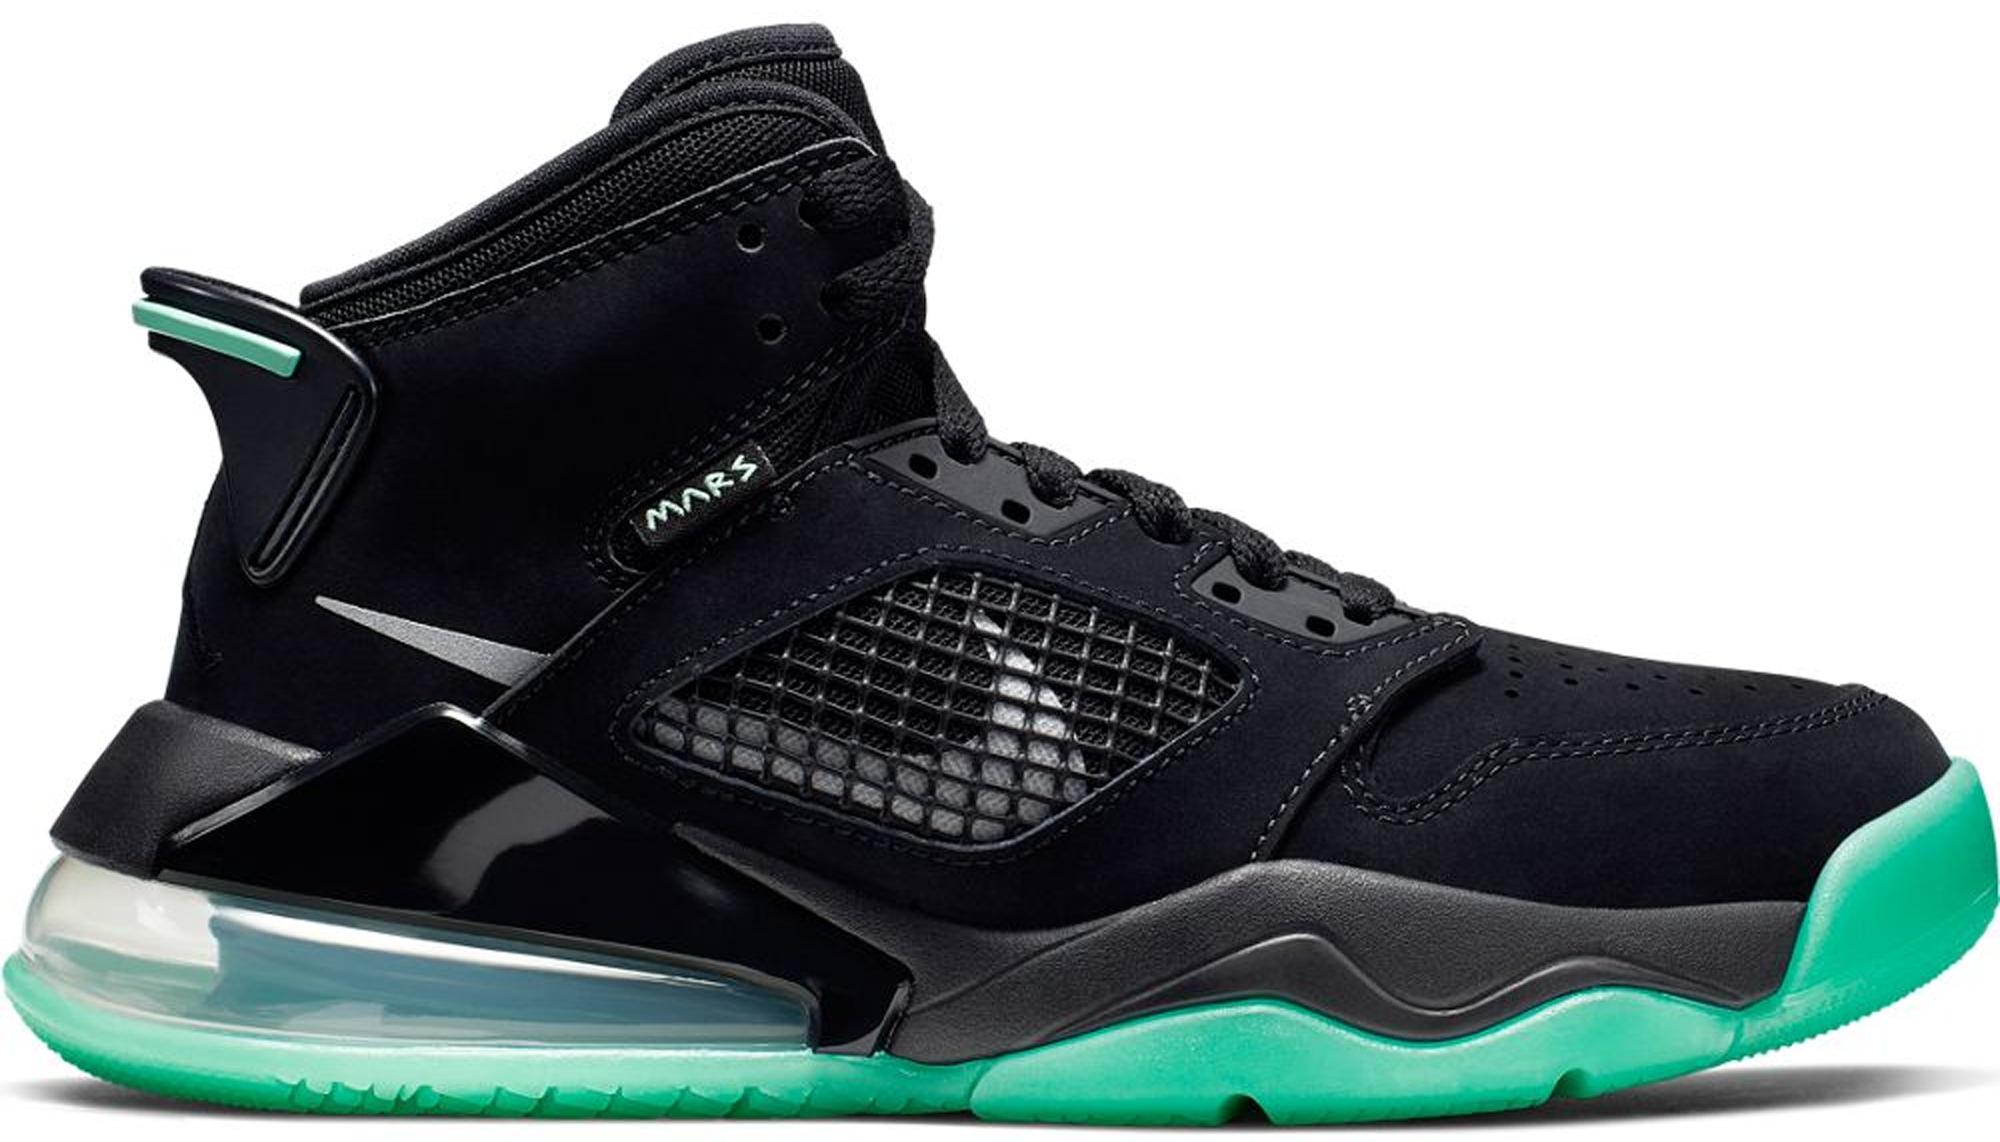 Jordan Mars 270 Black Green Glow (GS